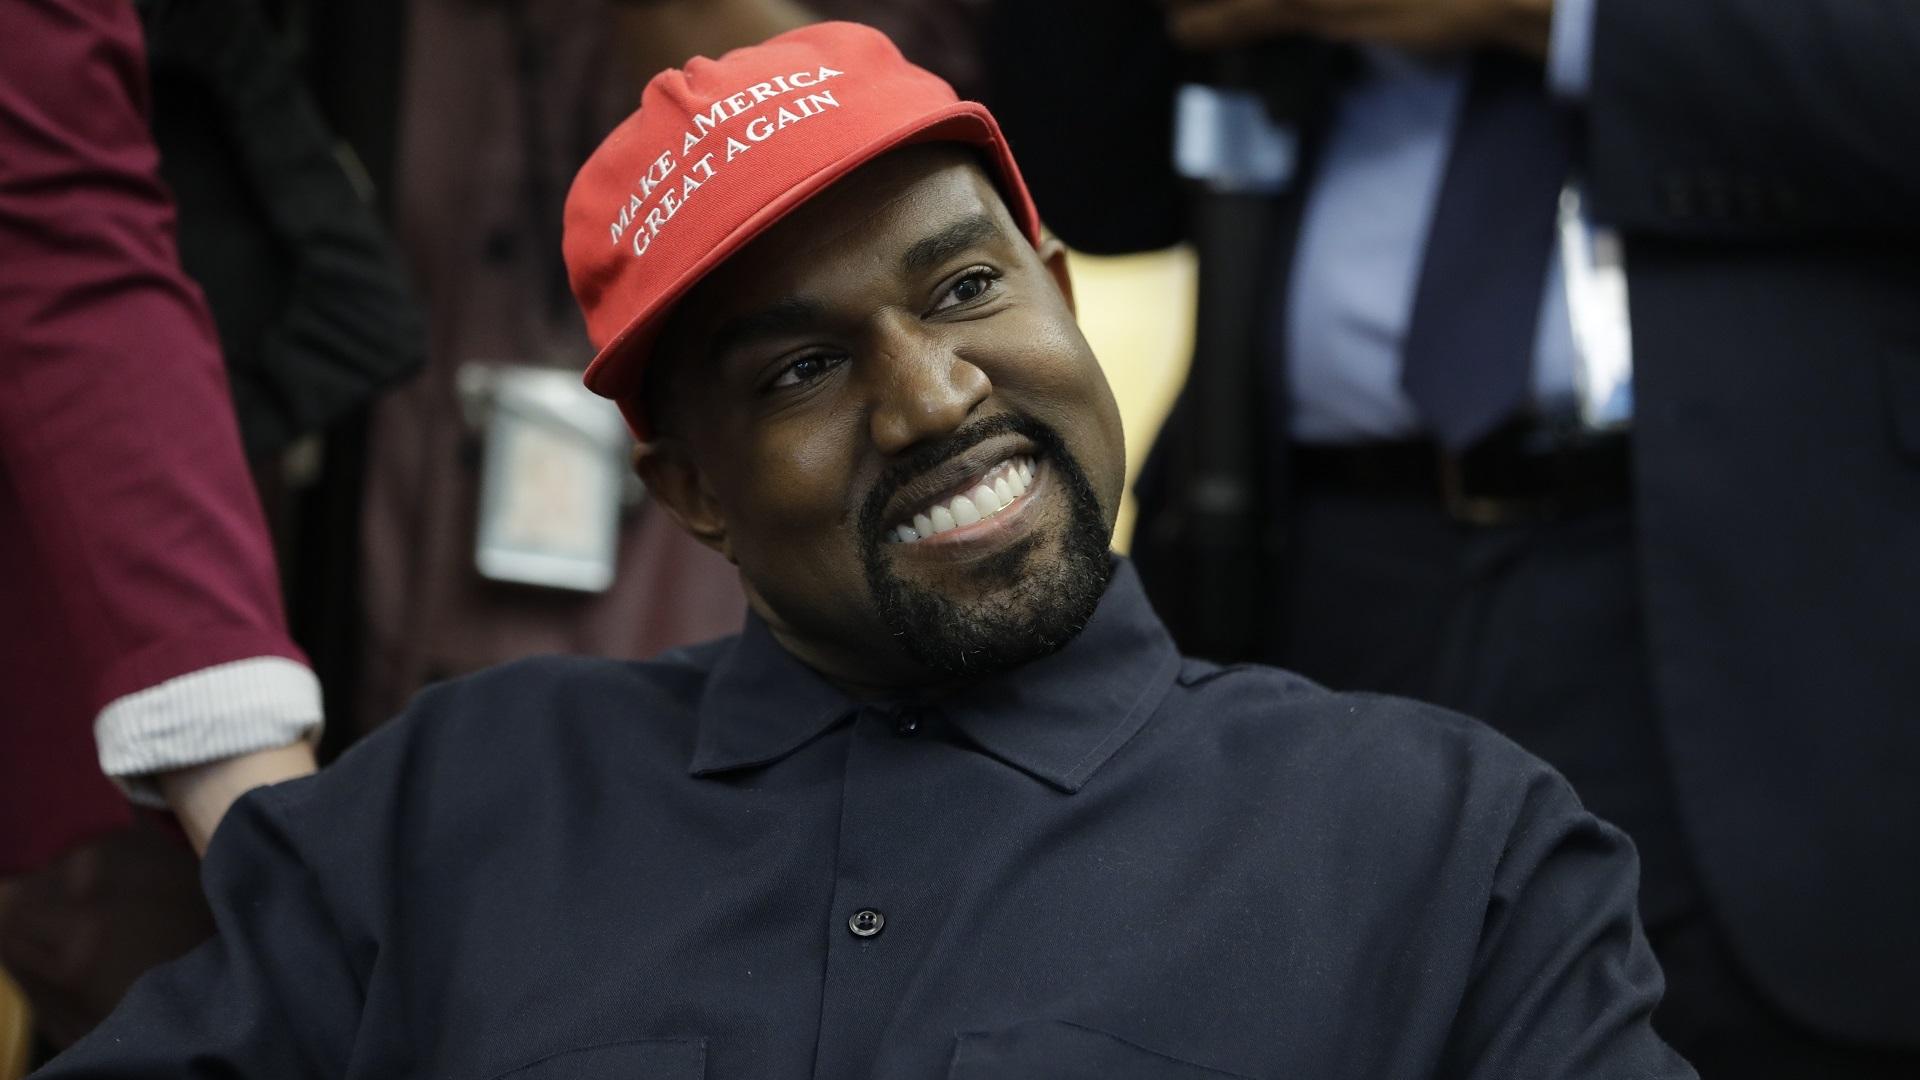 Trump Kanye West_1540836698753